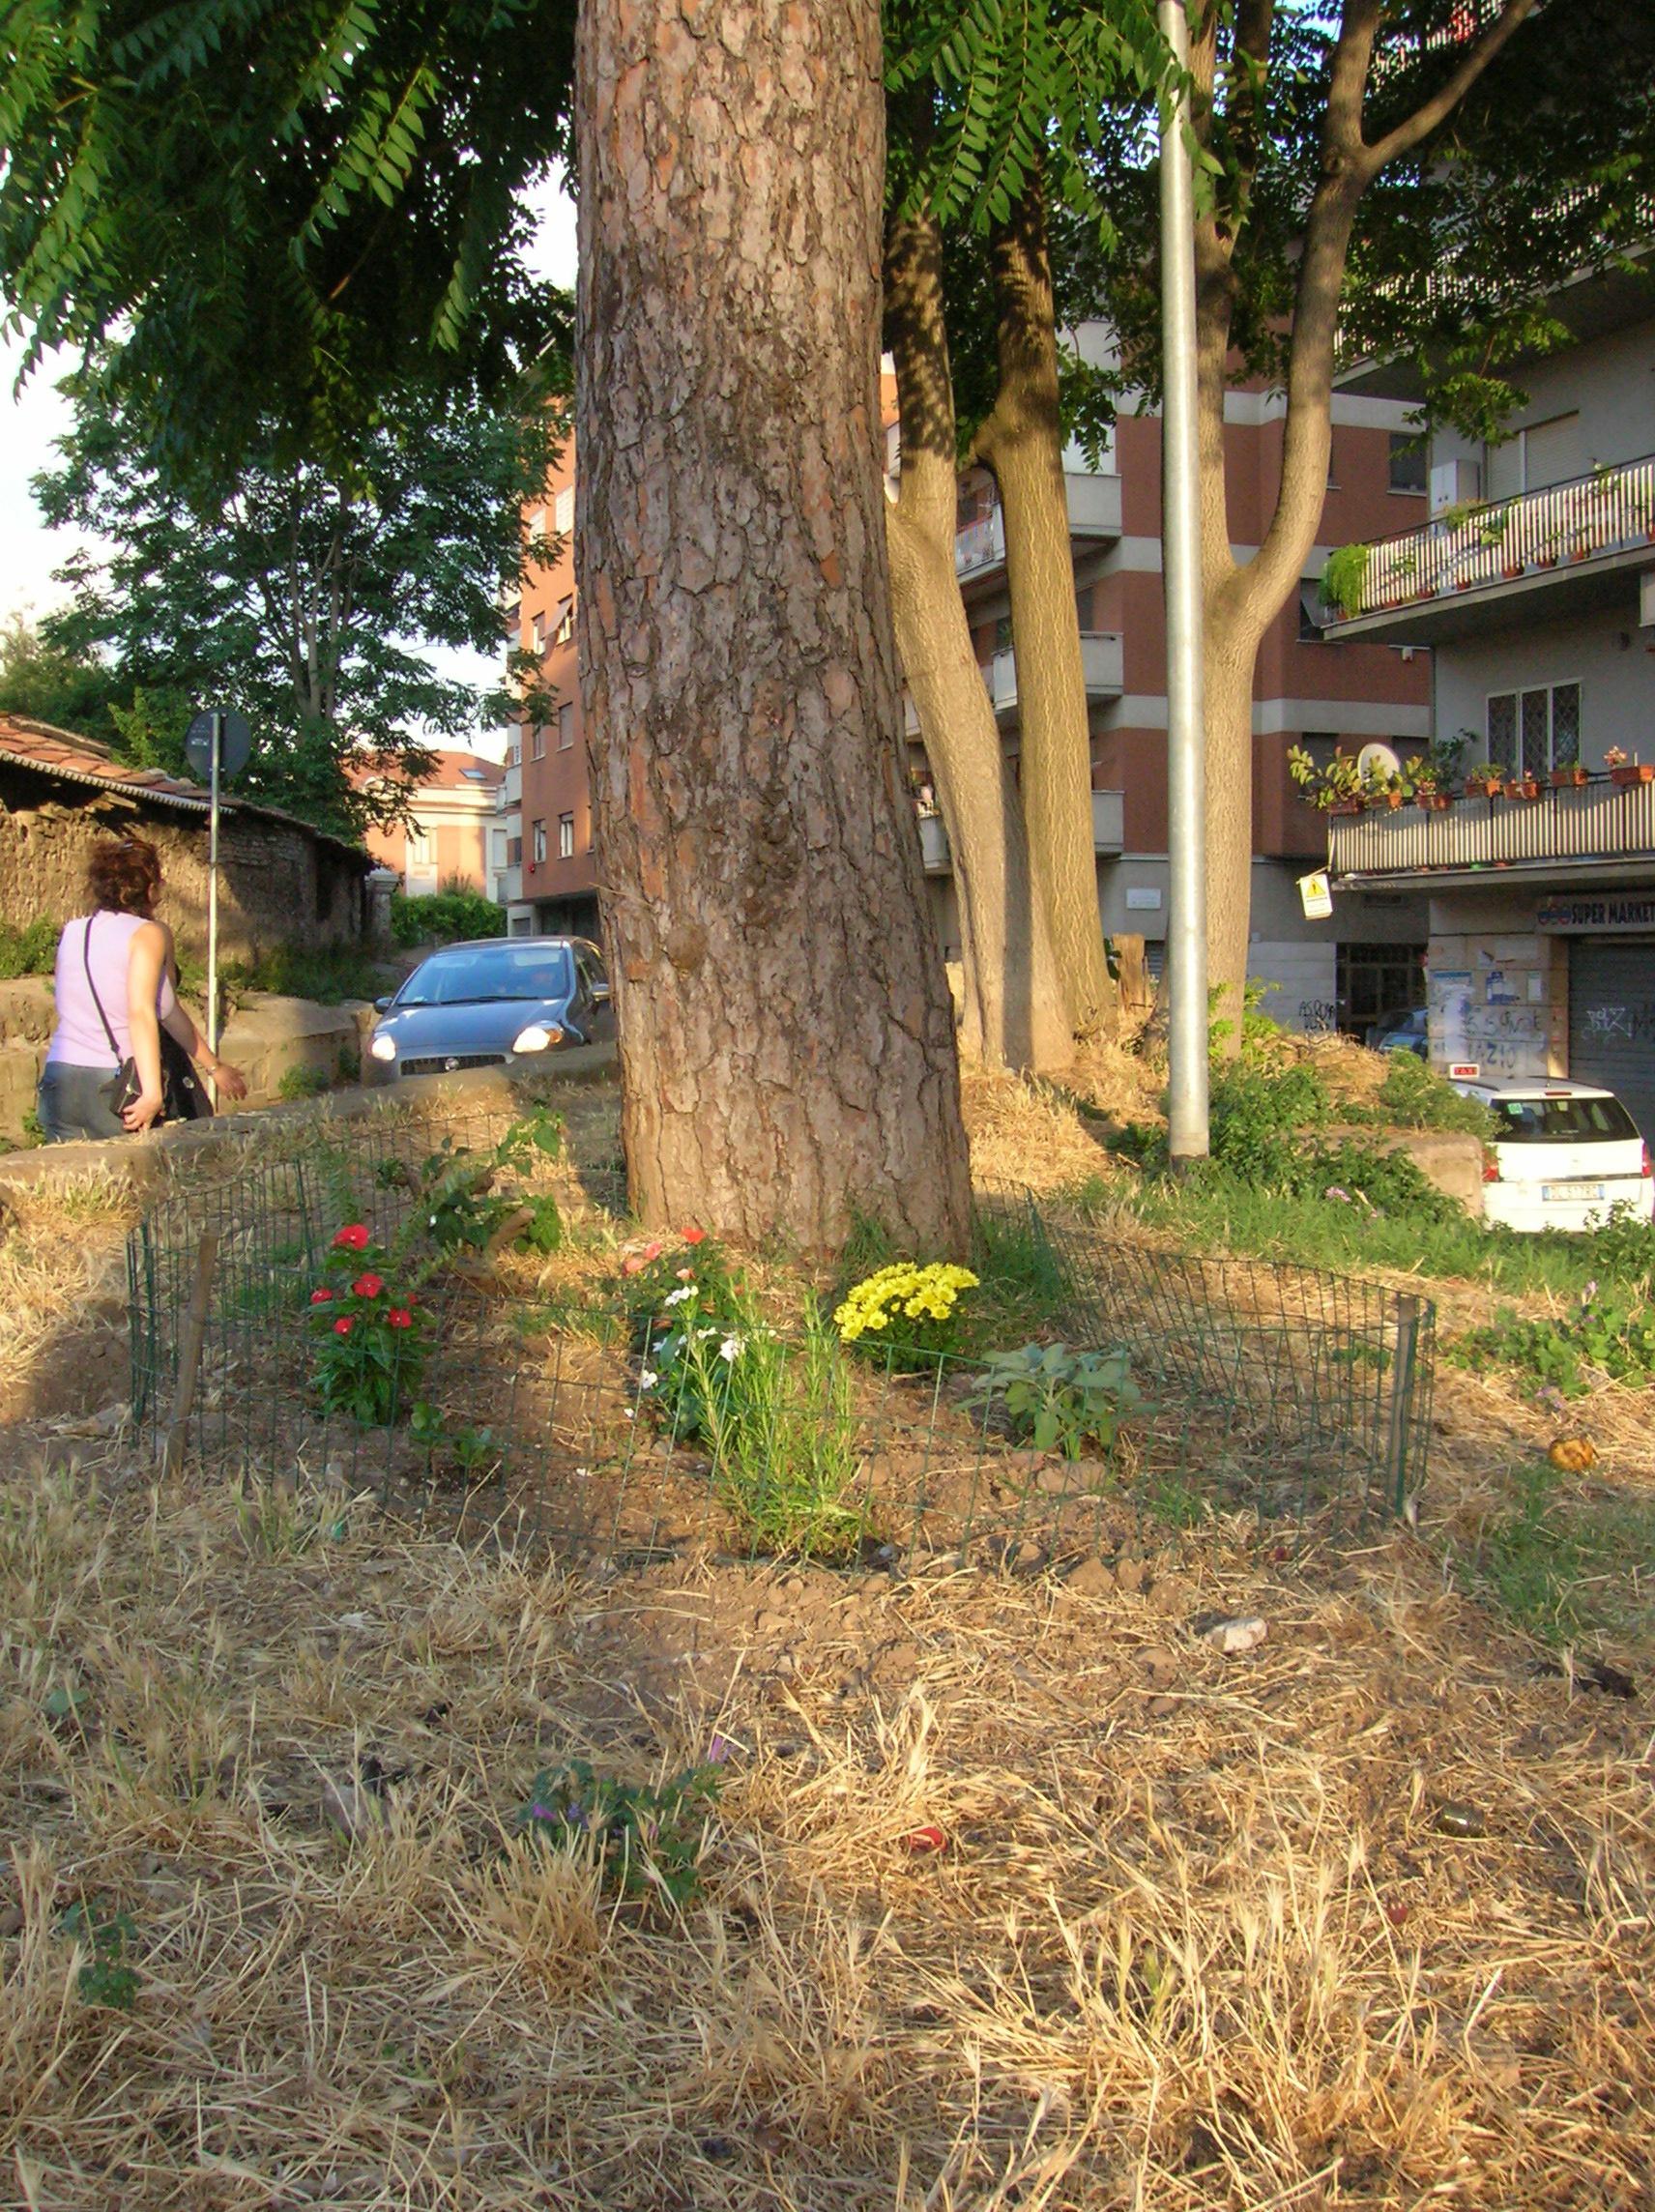 File:Guerrilla gardening in Pigneto (Rome) 2.JPG - Wikimedia Commons